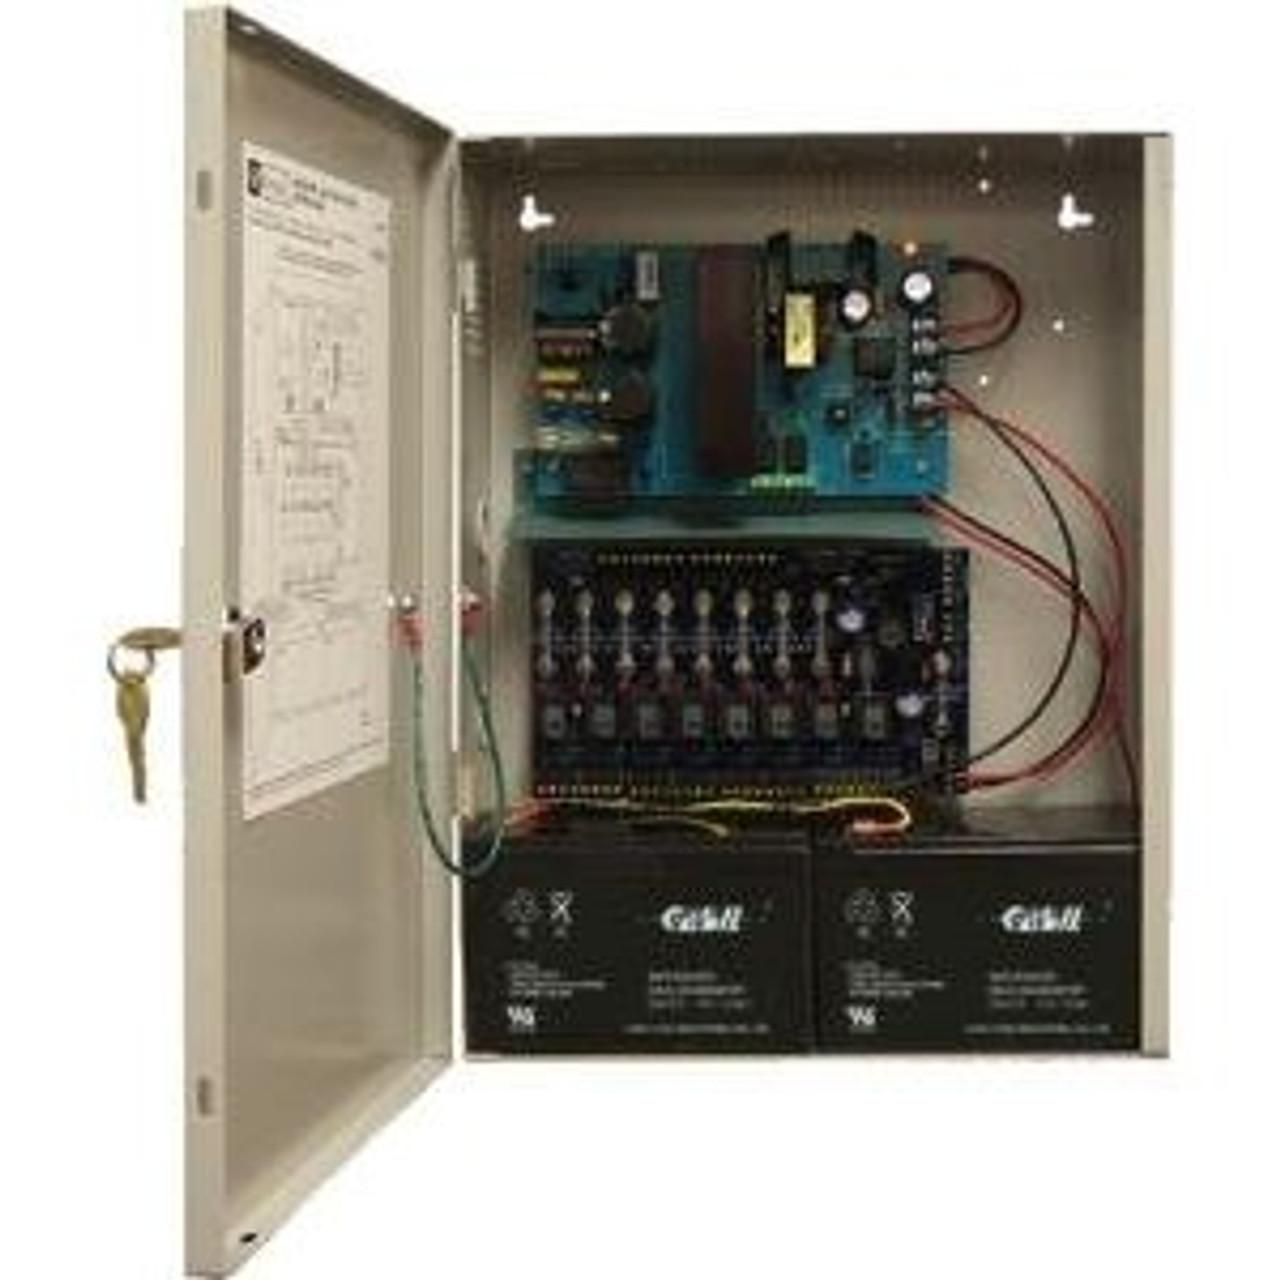 altronix relays wiring diagrams altronix al400ulacm8 access control power supply  al400ulacm8 access control power supply